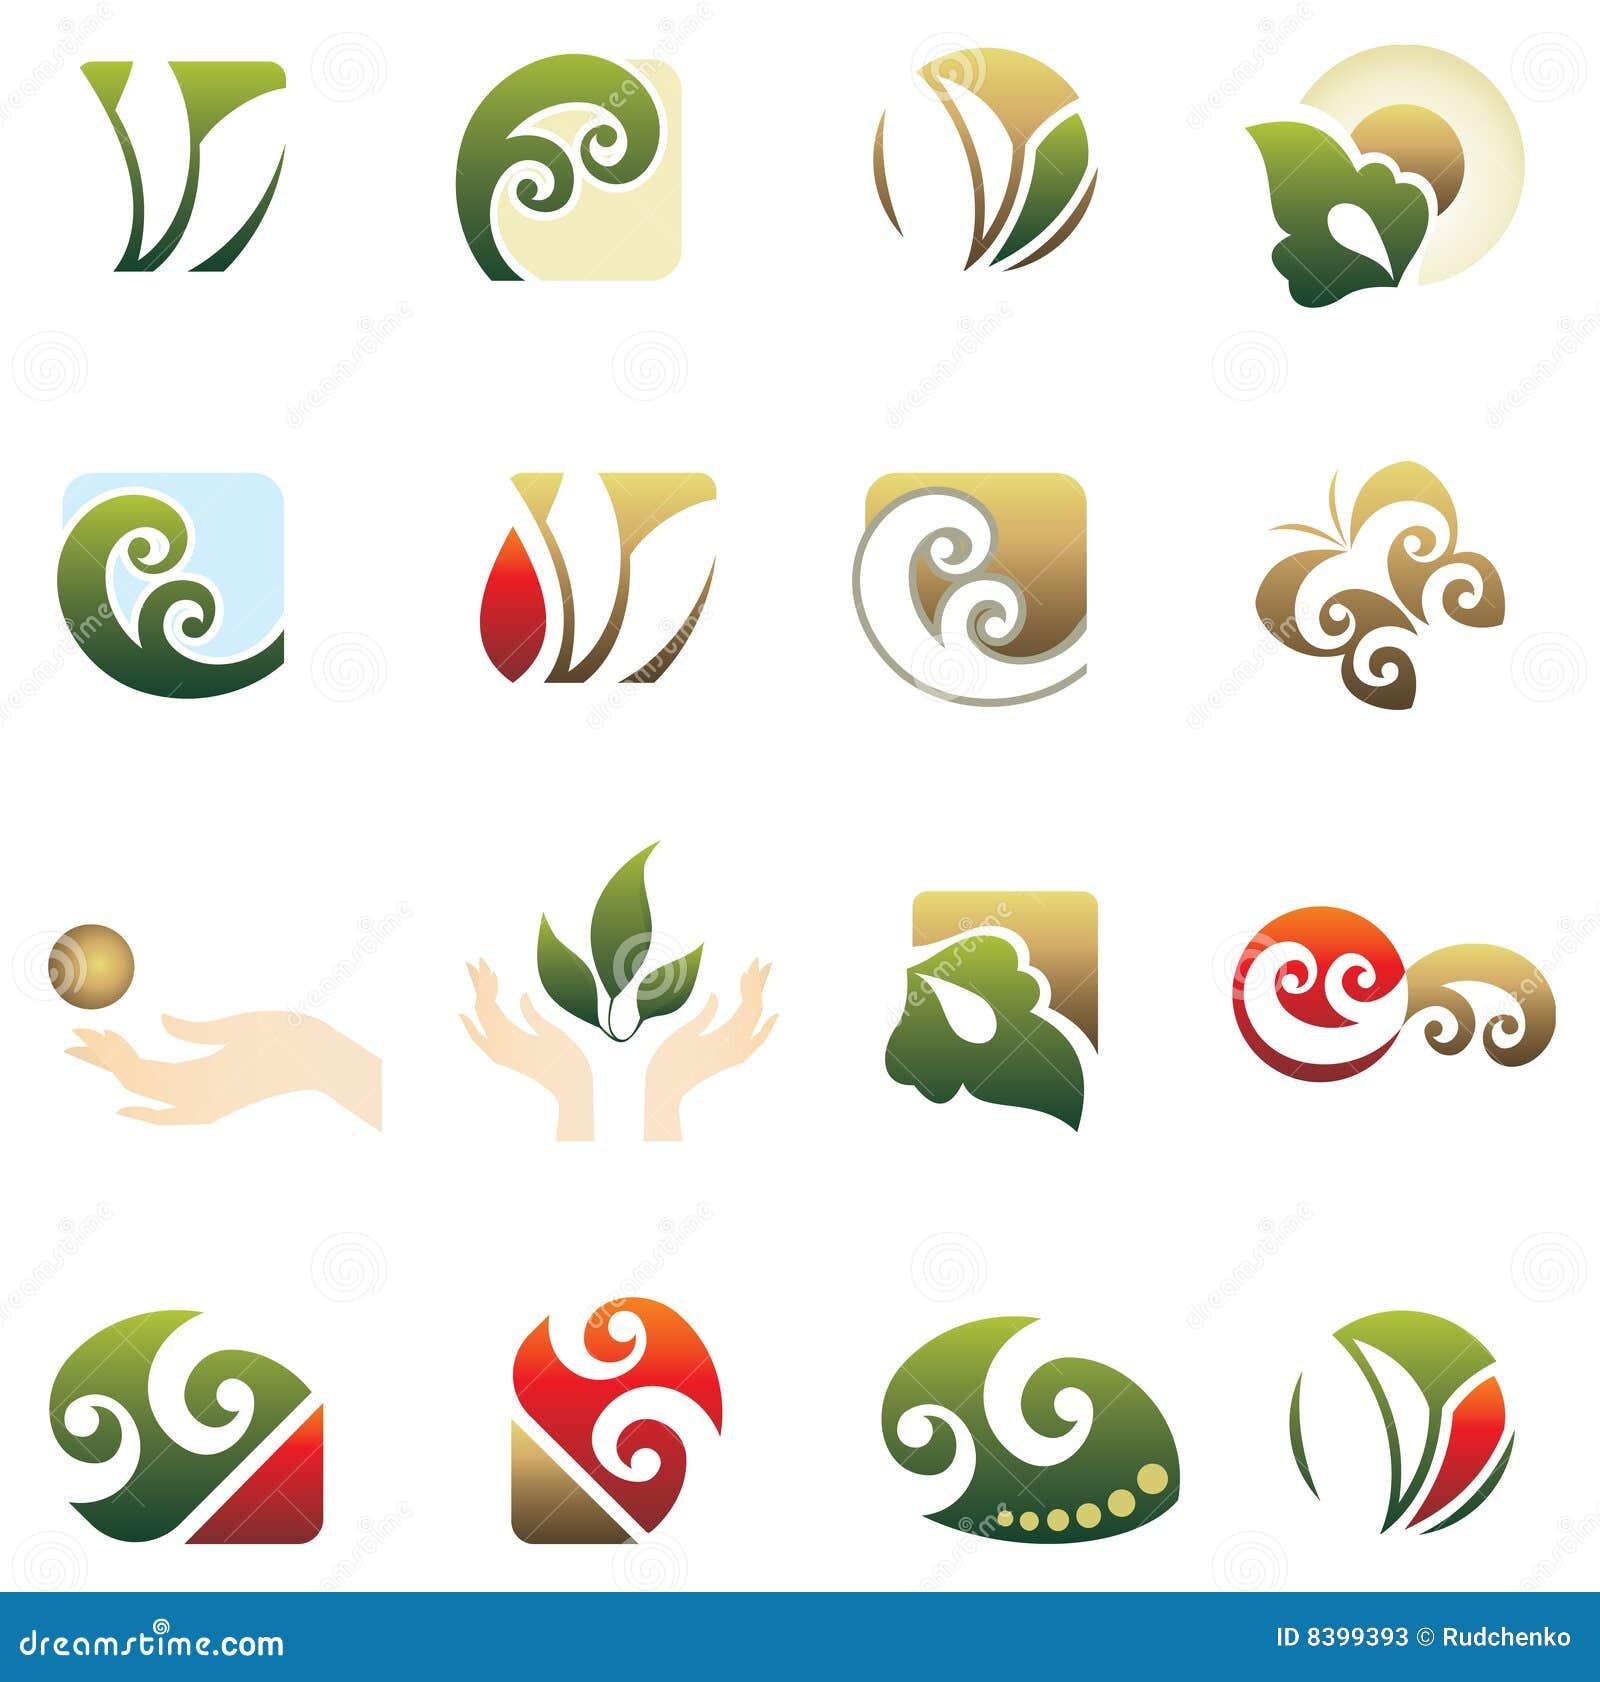 freelogodesignorg  Create Your Own Logo Its Free!